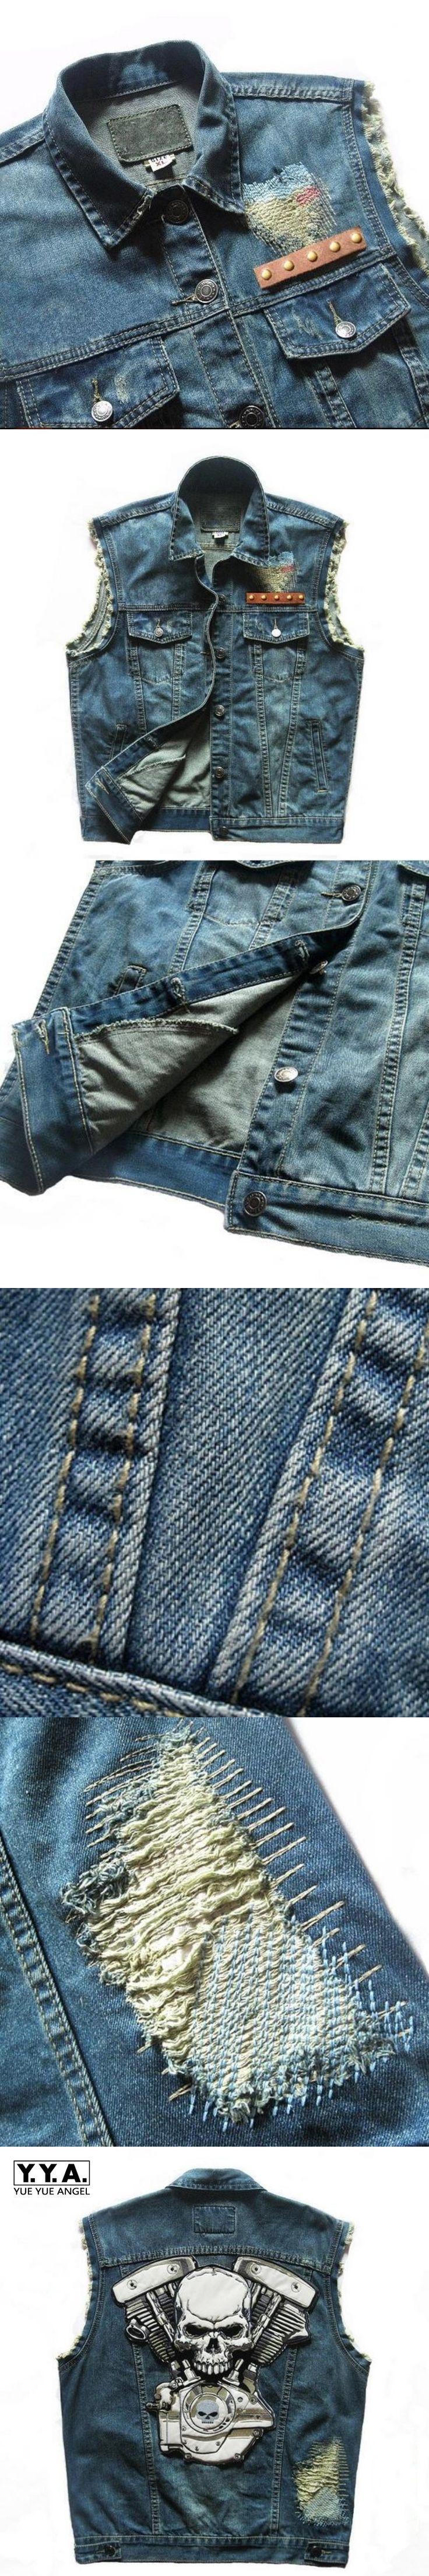 Top Brand Punk Cowboy Fashion Mens Skull Badge Hole Motorcycle Vests Waistcoats Cotton Male Sleeveless Jean Jackets Coat 5XL